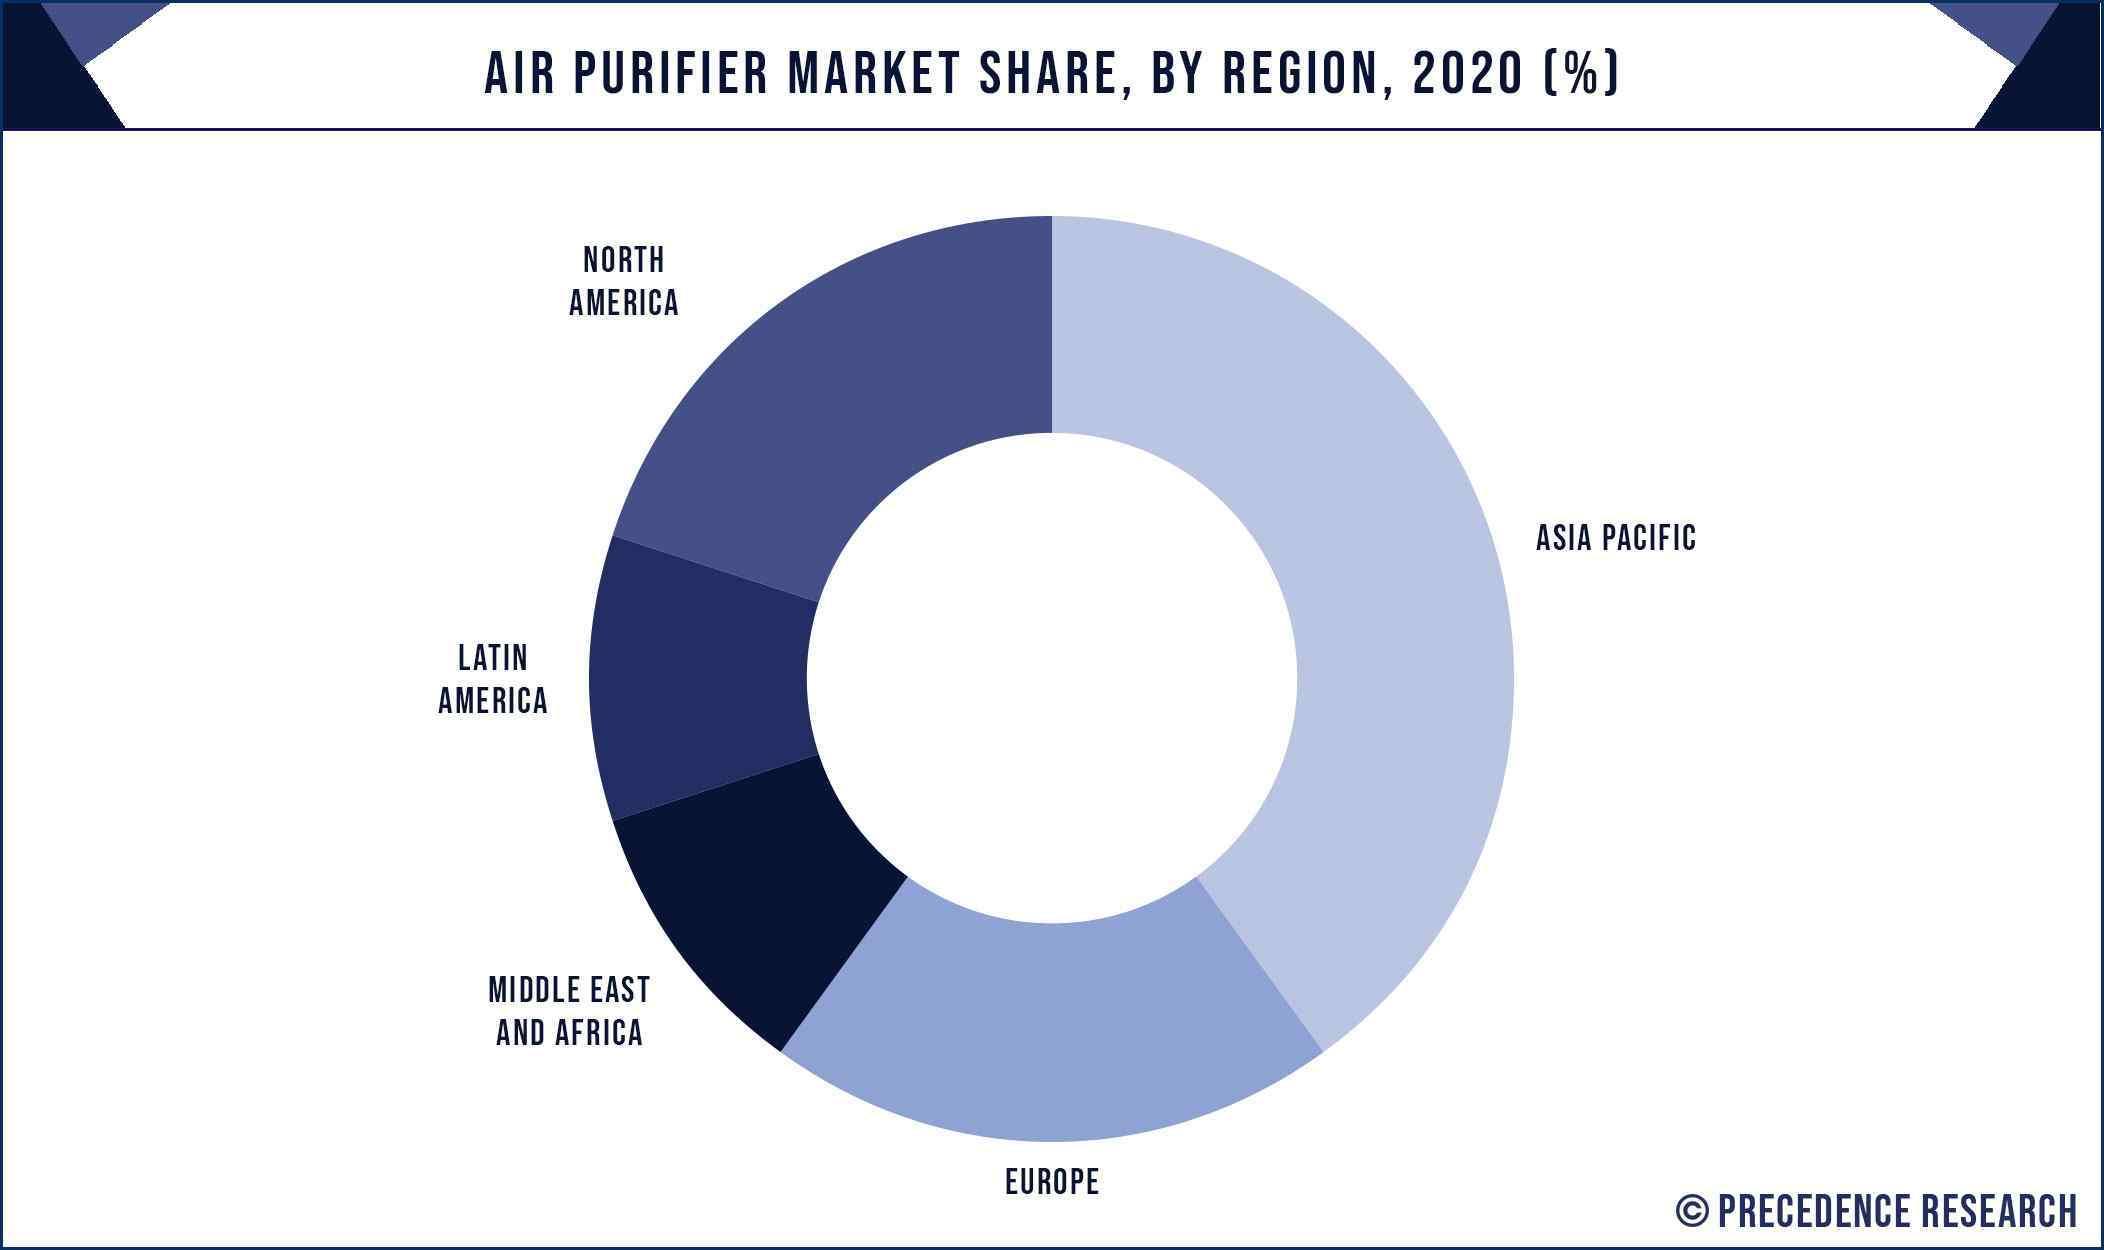 Air Purifier Market Share, By Region, 2020 (%)